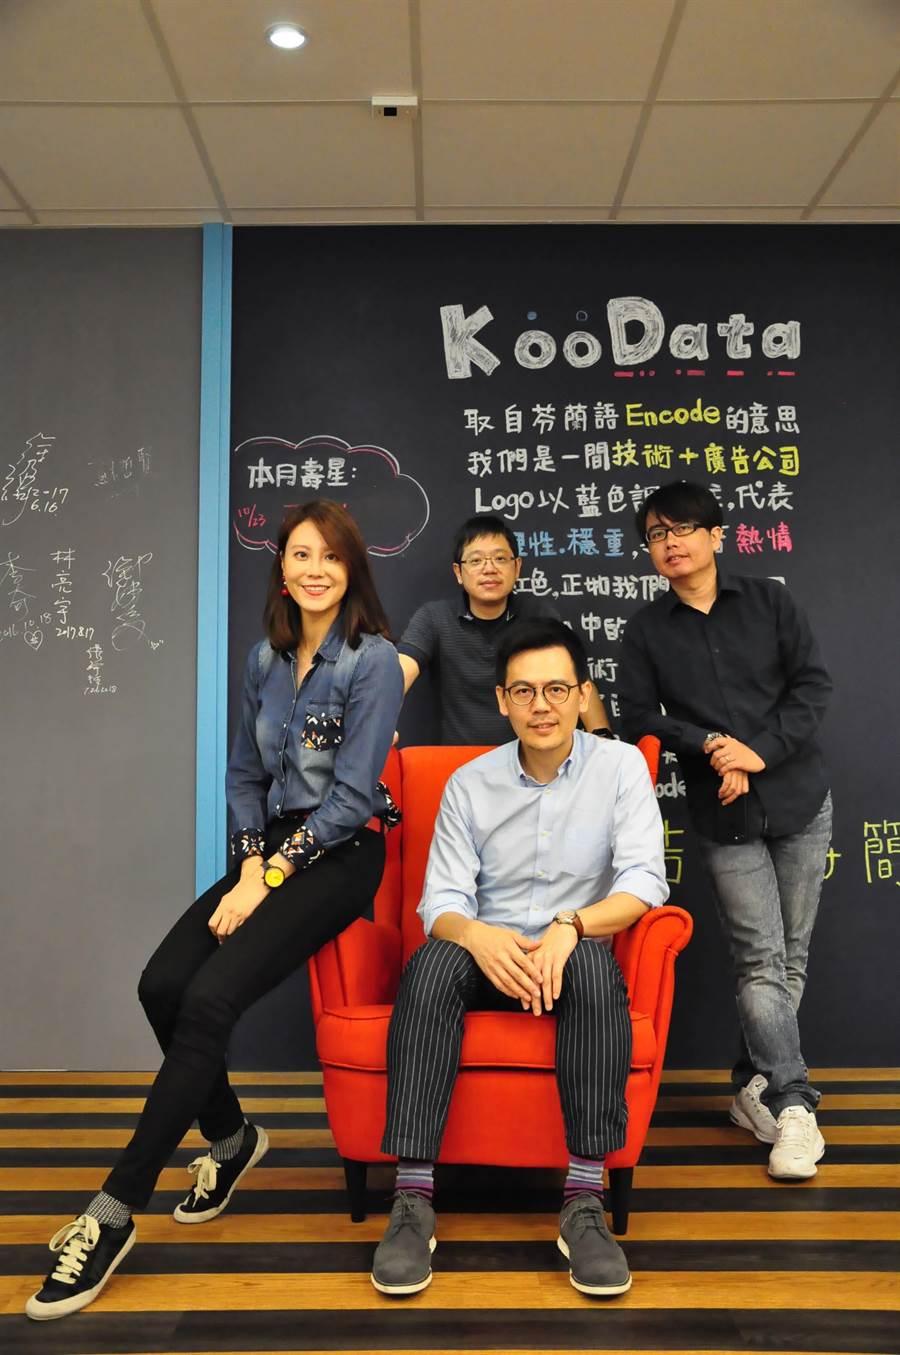 KooData完成A輪募資,最新獲得約台幣7500萬資金,圖為經營團隊,左起為KooData營運長孟逸錤、策略長方乃正(中後)、執行長孫健慎(中前)、技術長吳齊人。(業者提供)